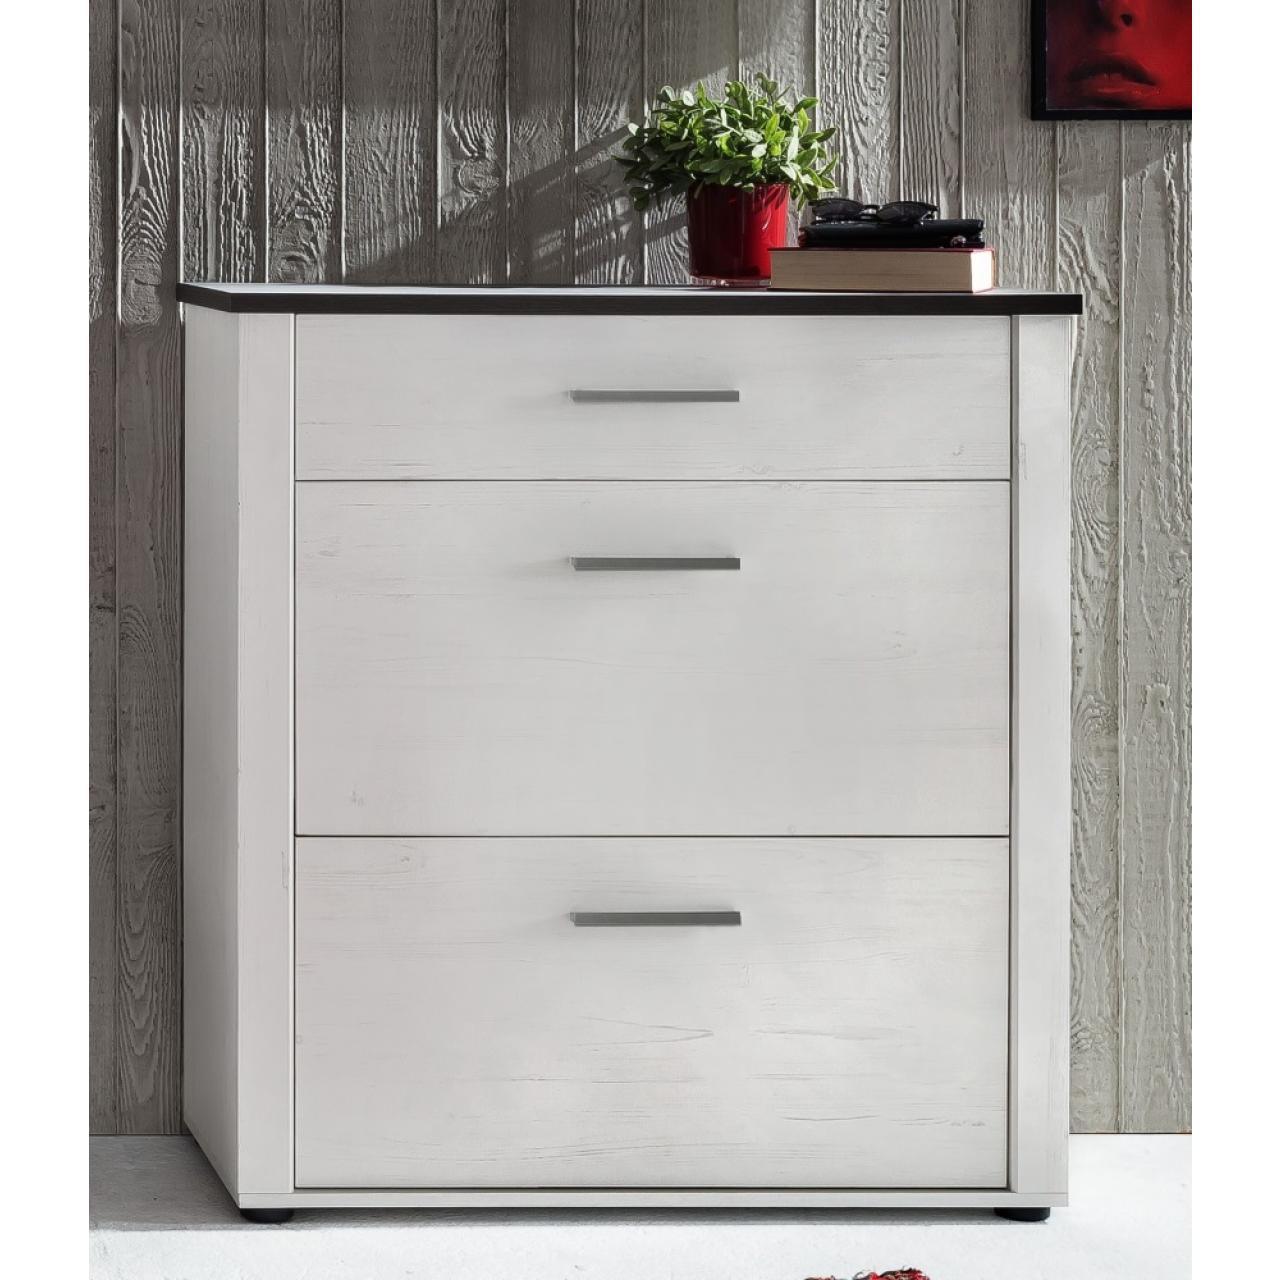 Garderobenschuhkipper Dakota - Weiß mit Absetzungen in dunkelbraun